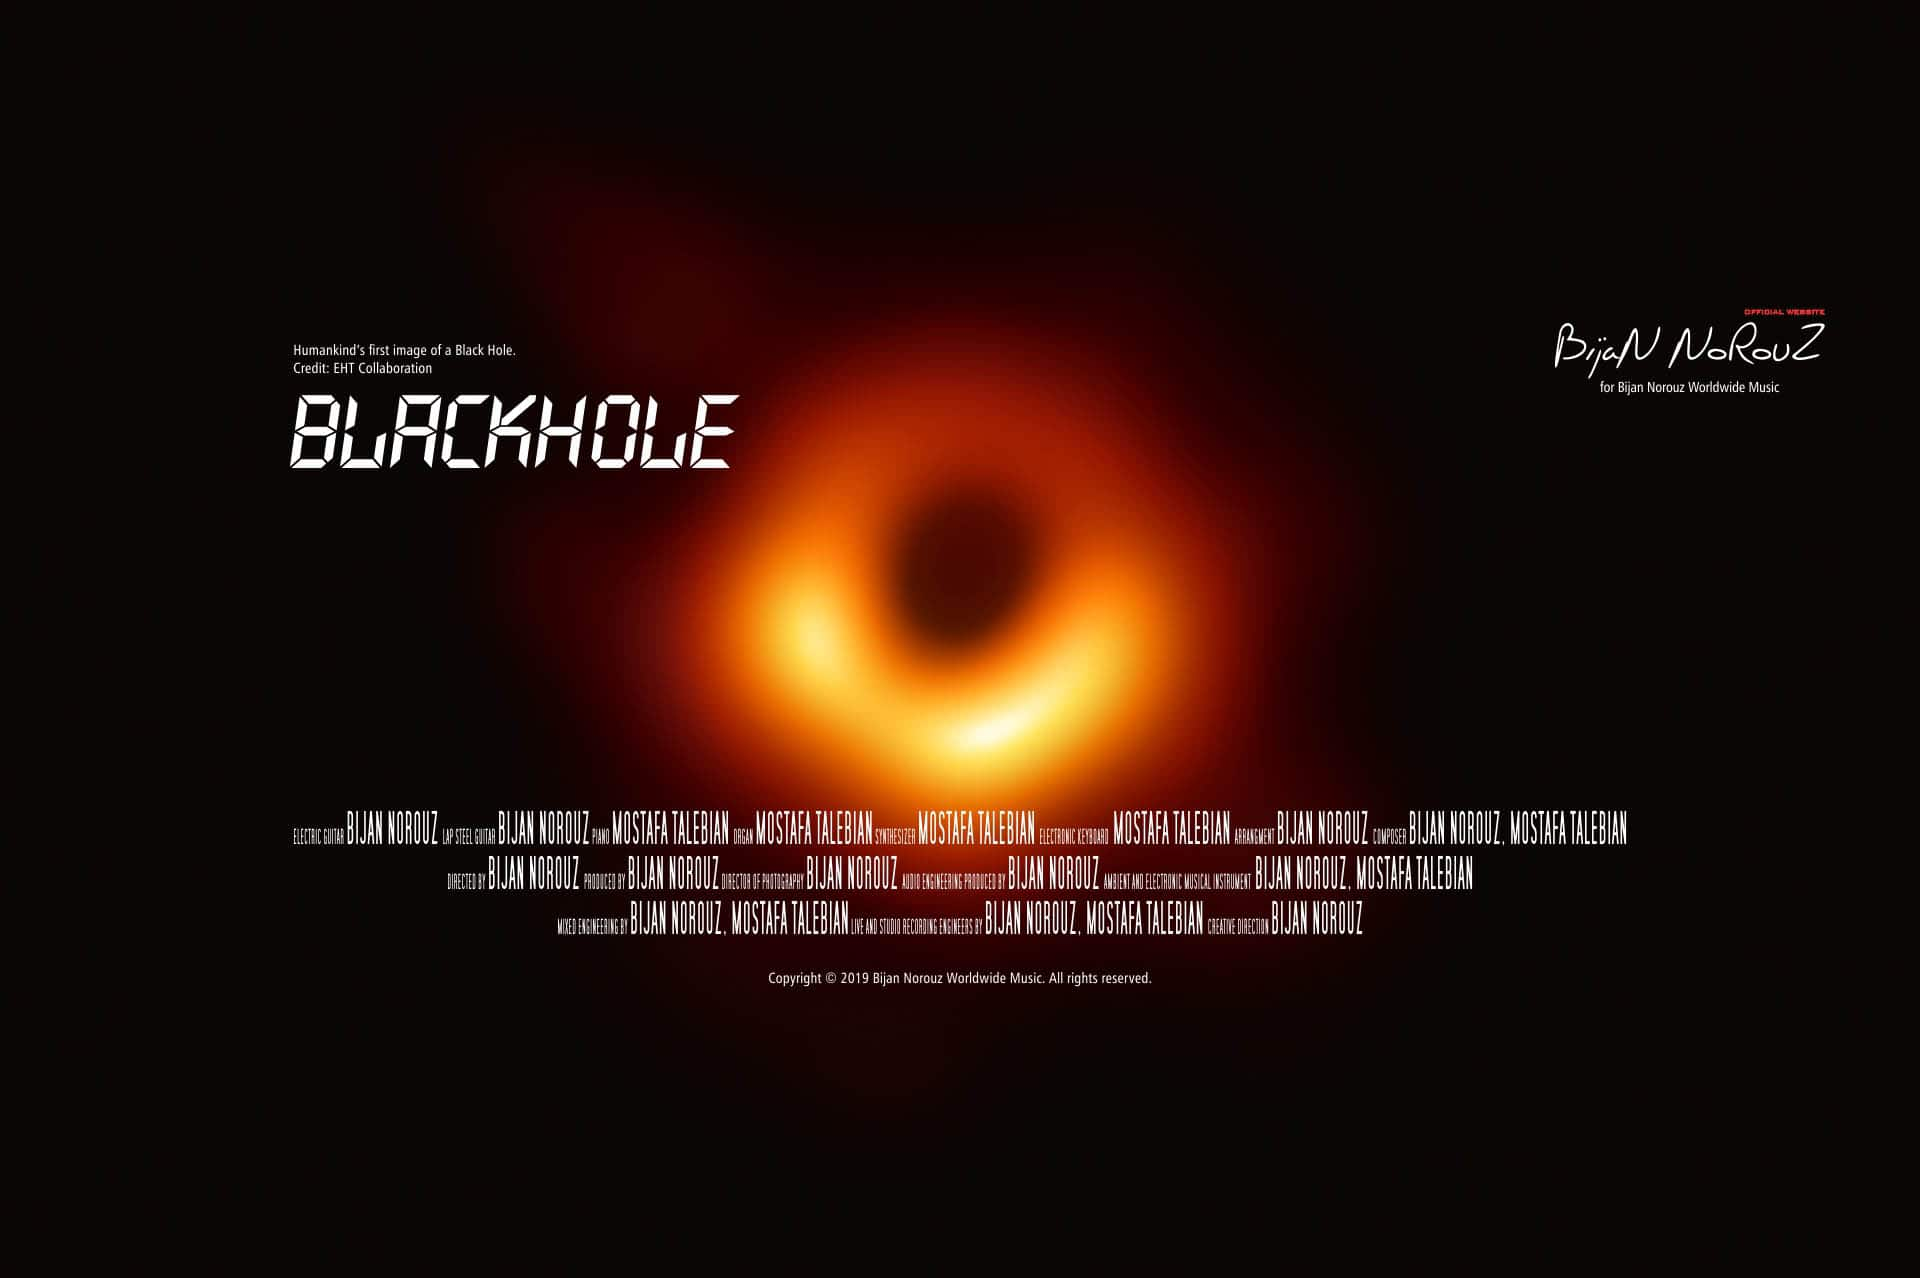 BlackHole-Bijan-norouz